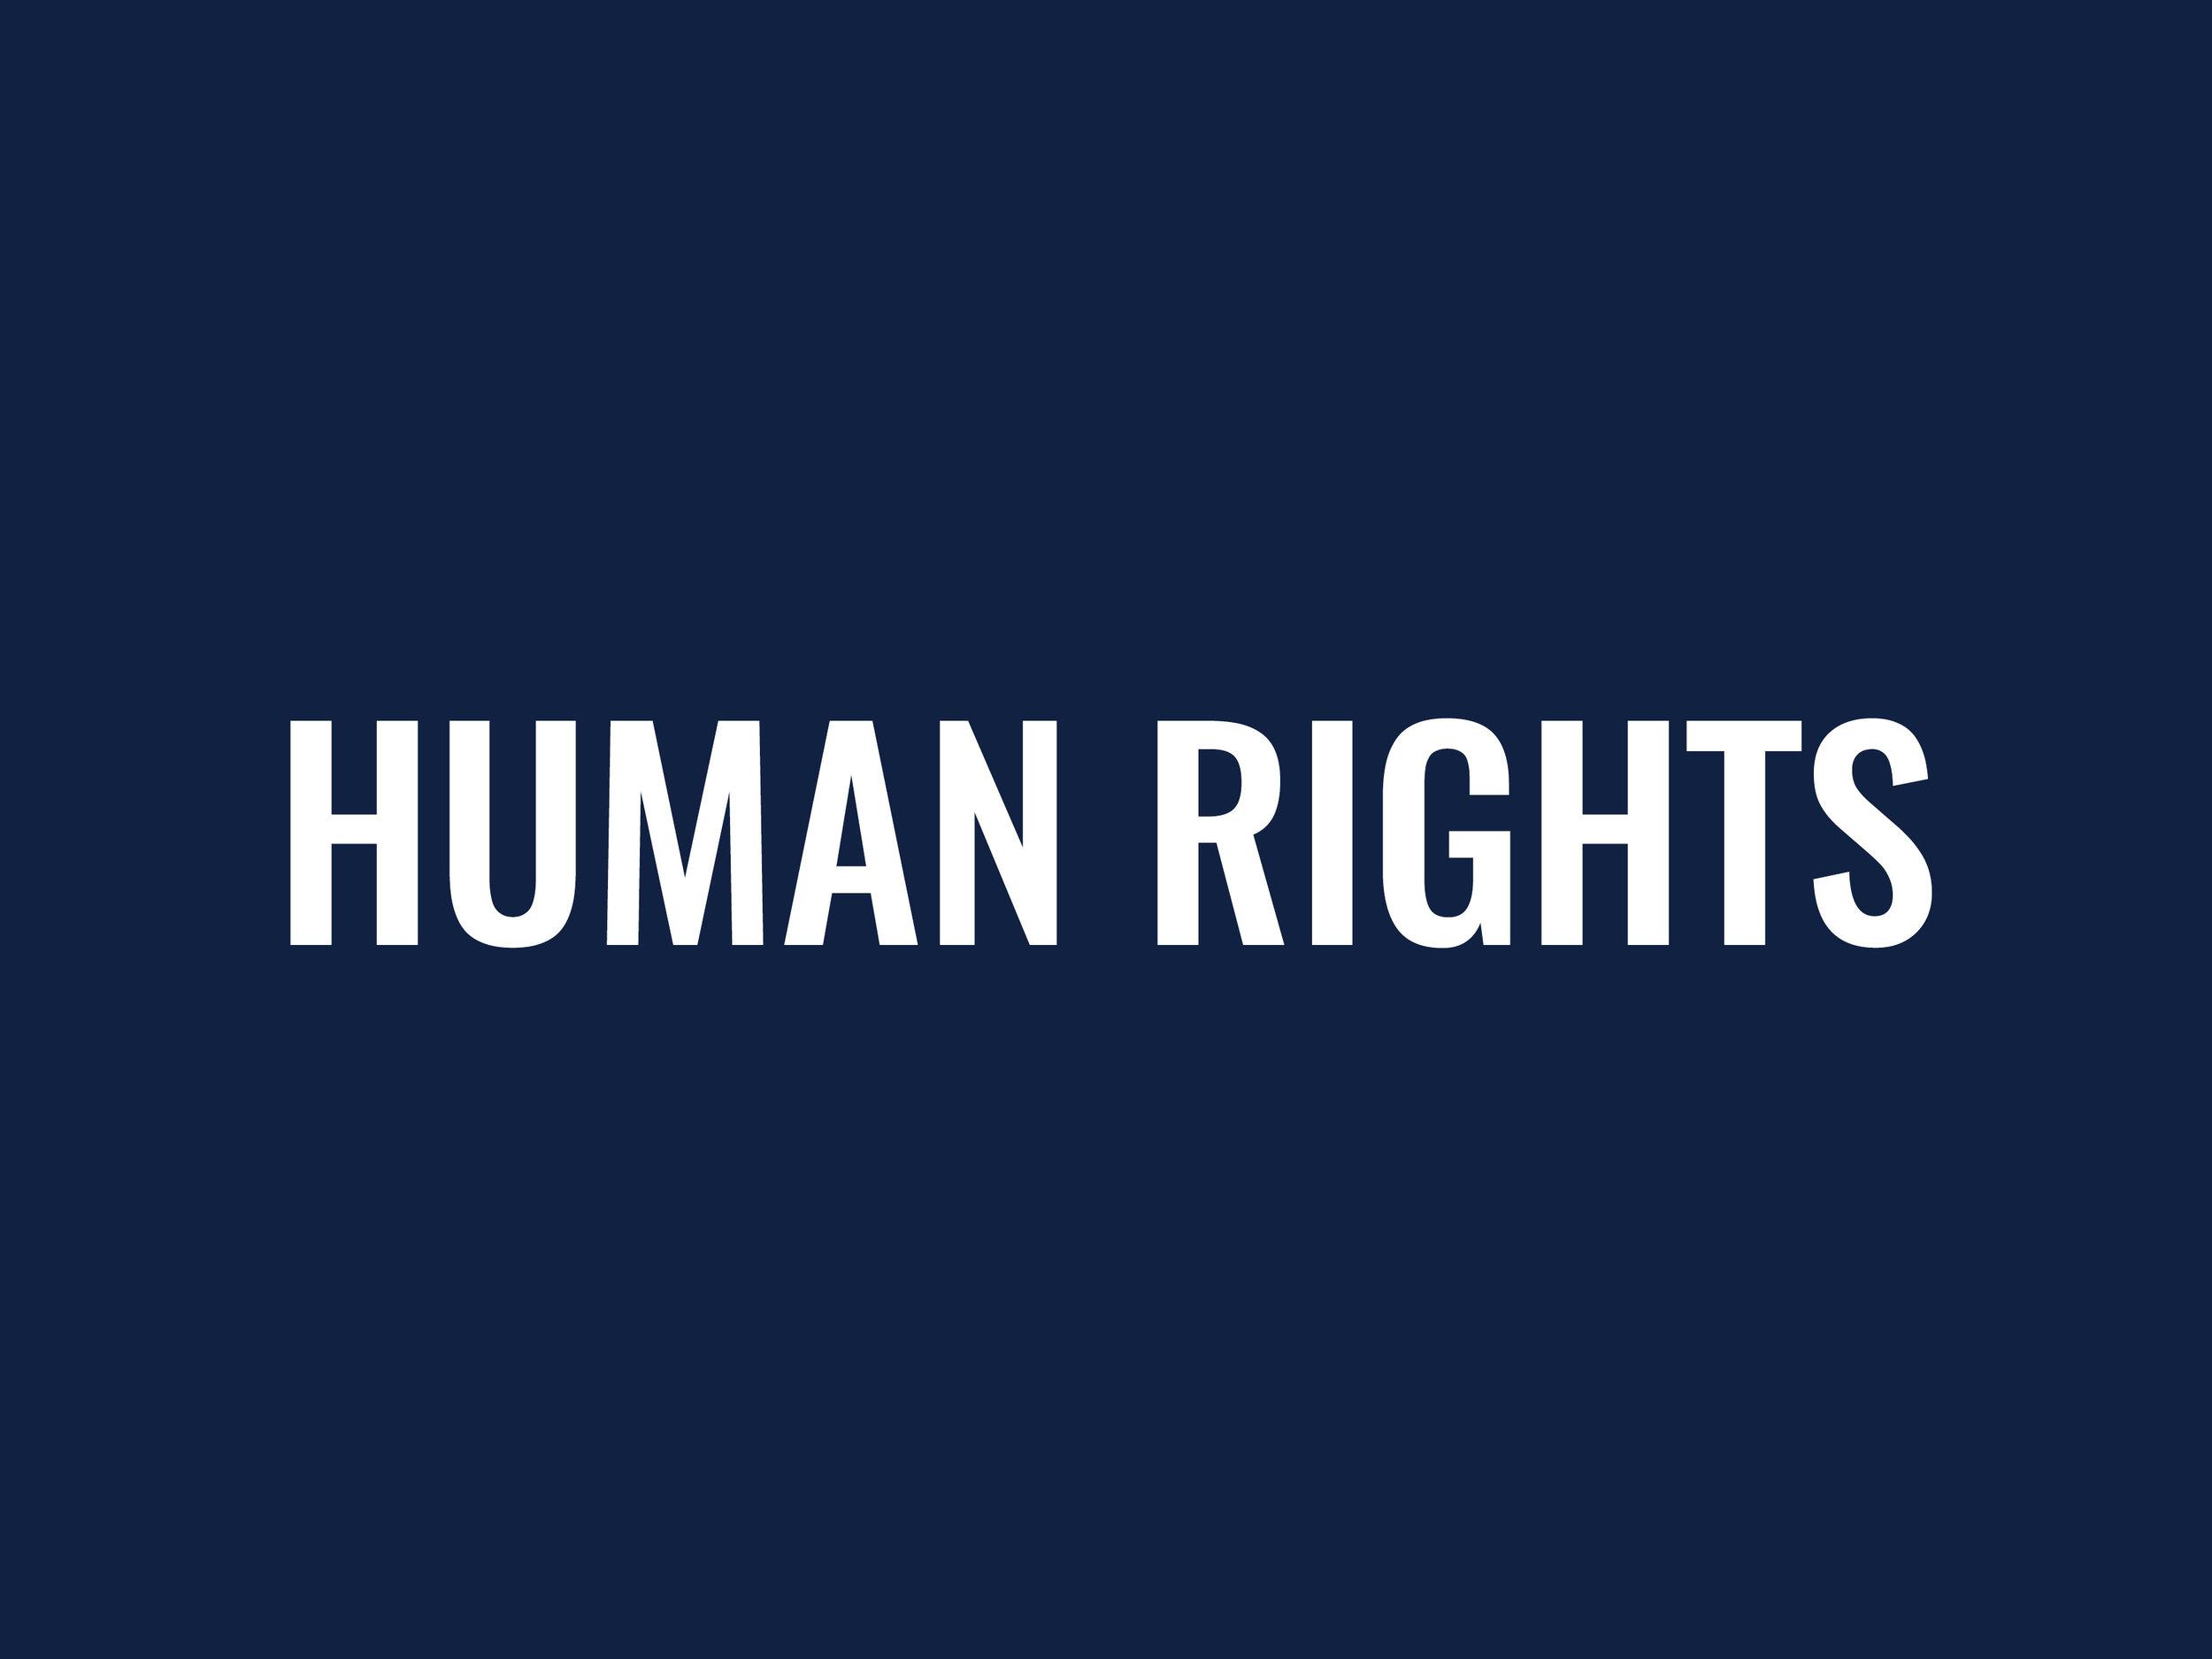 5 HUMAN RIGHTS.jpg